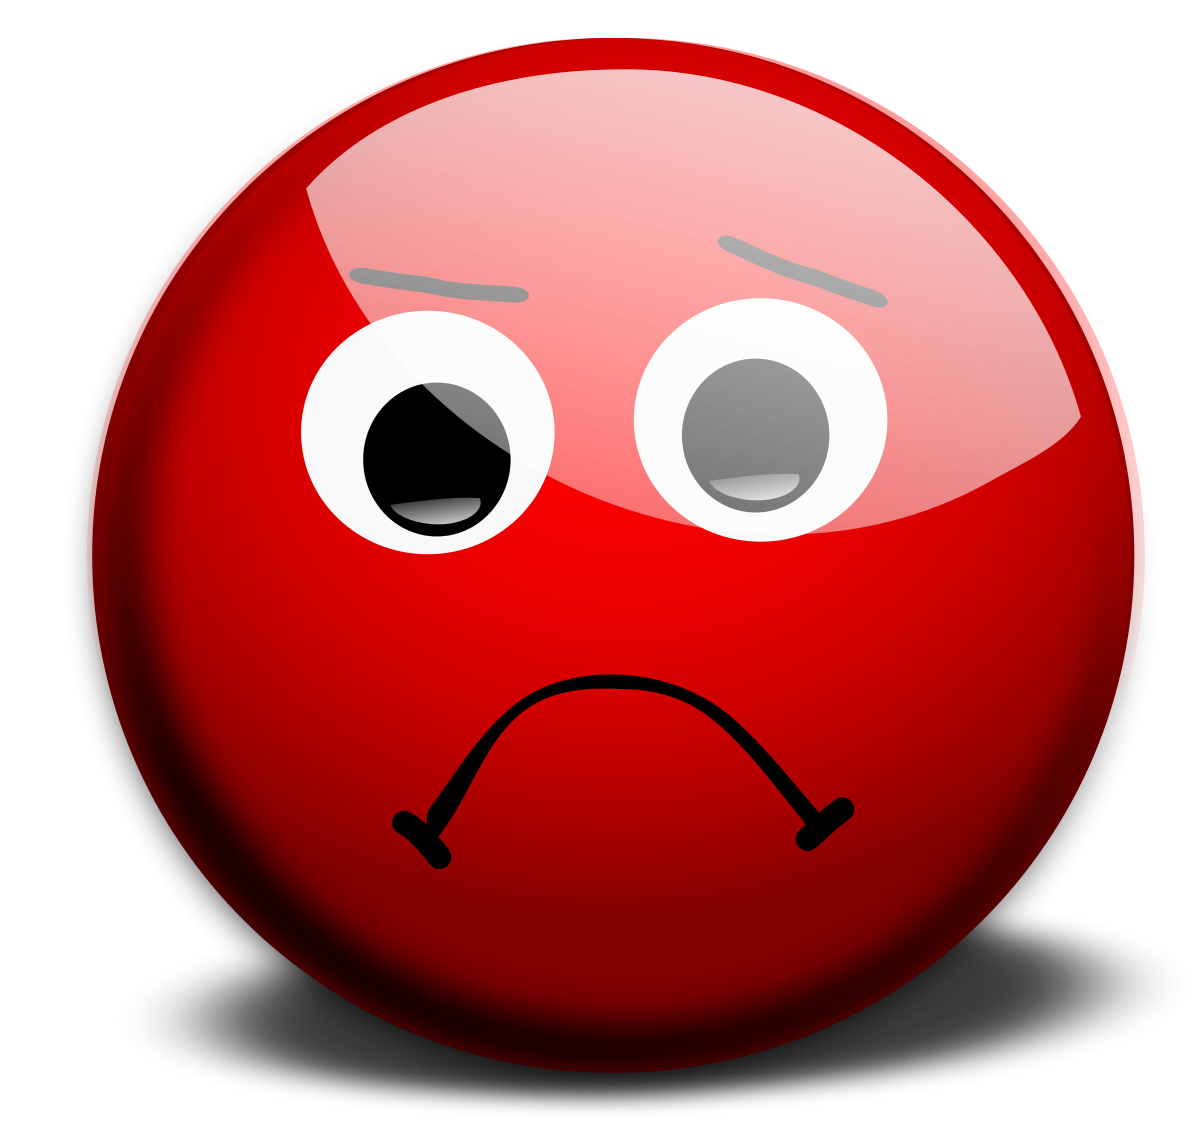 1200x1147 A Sad Face Clipart Image